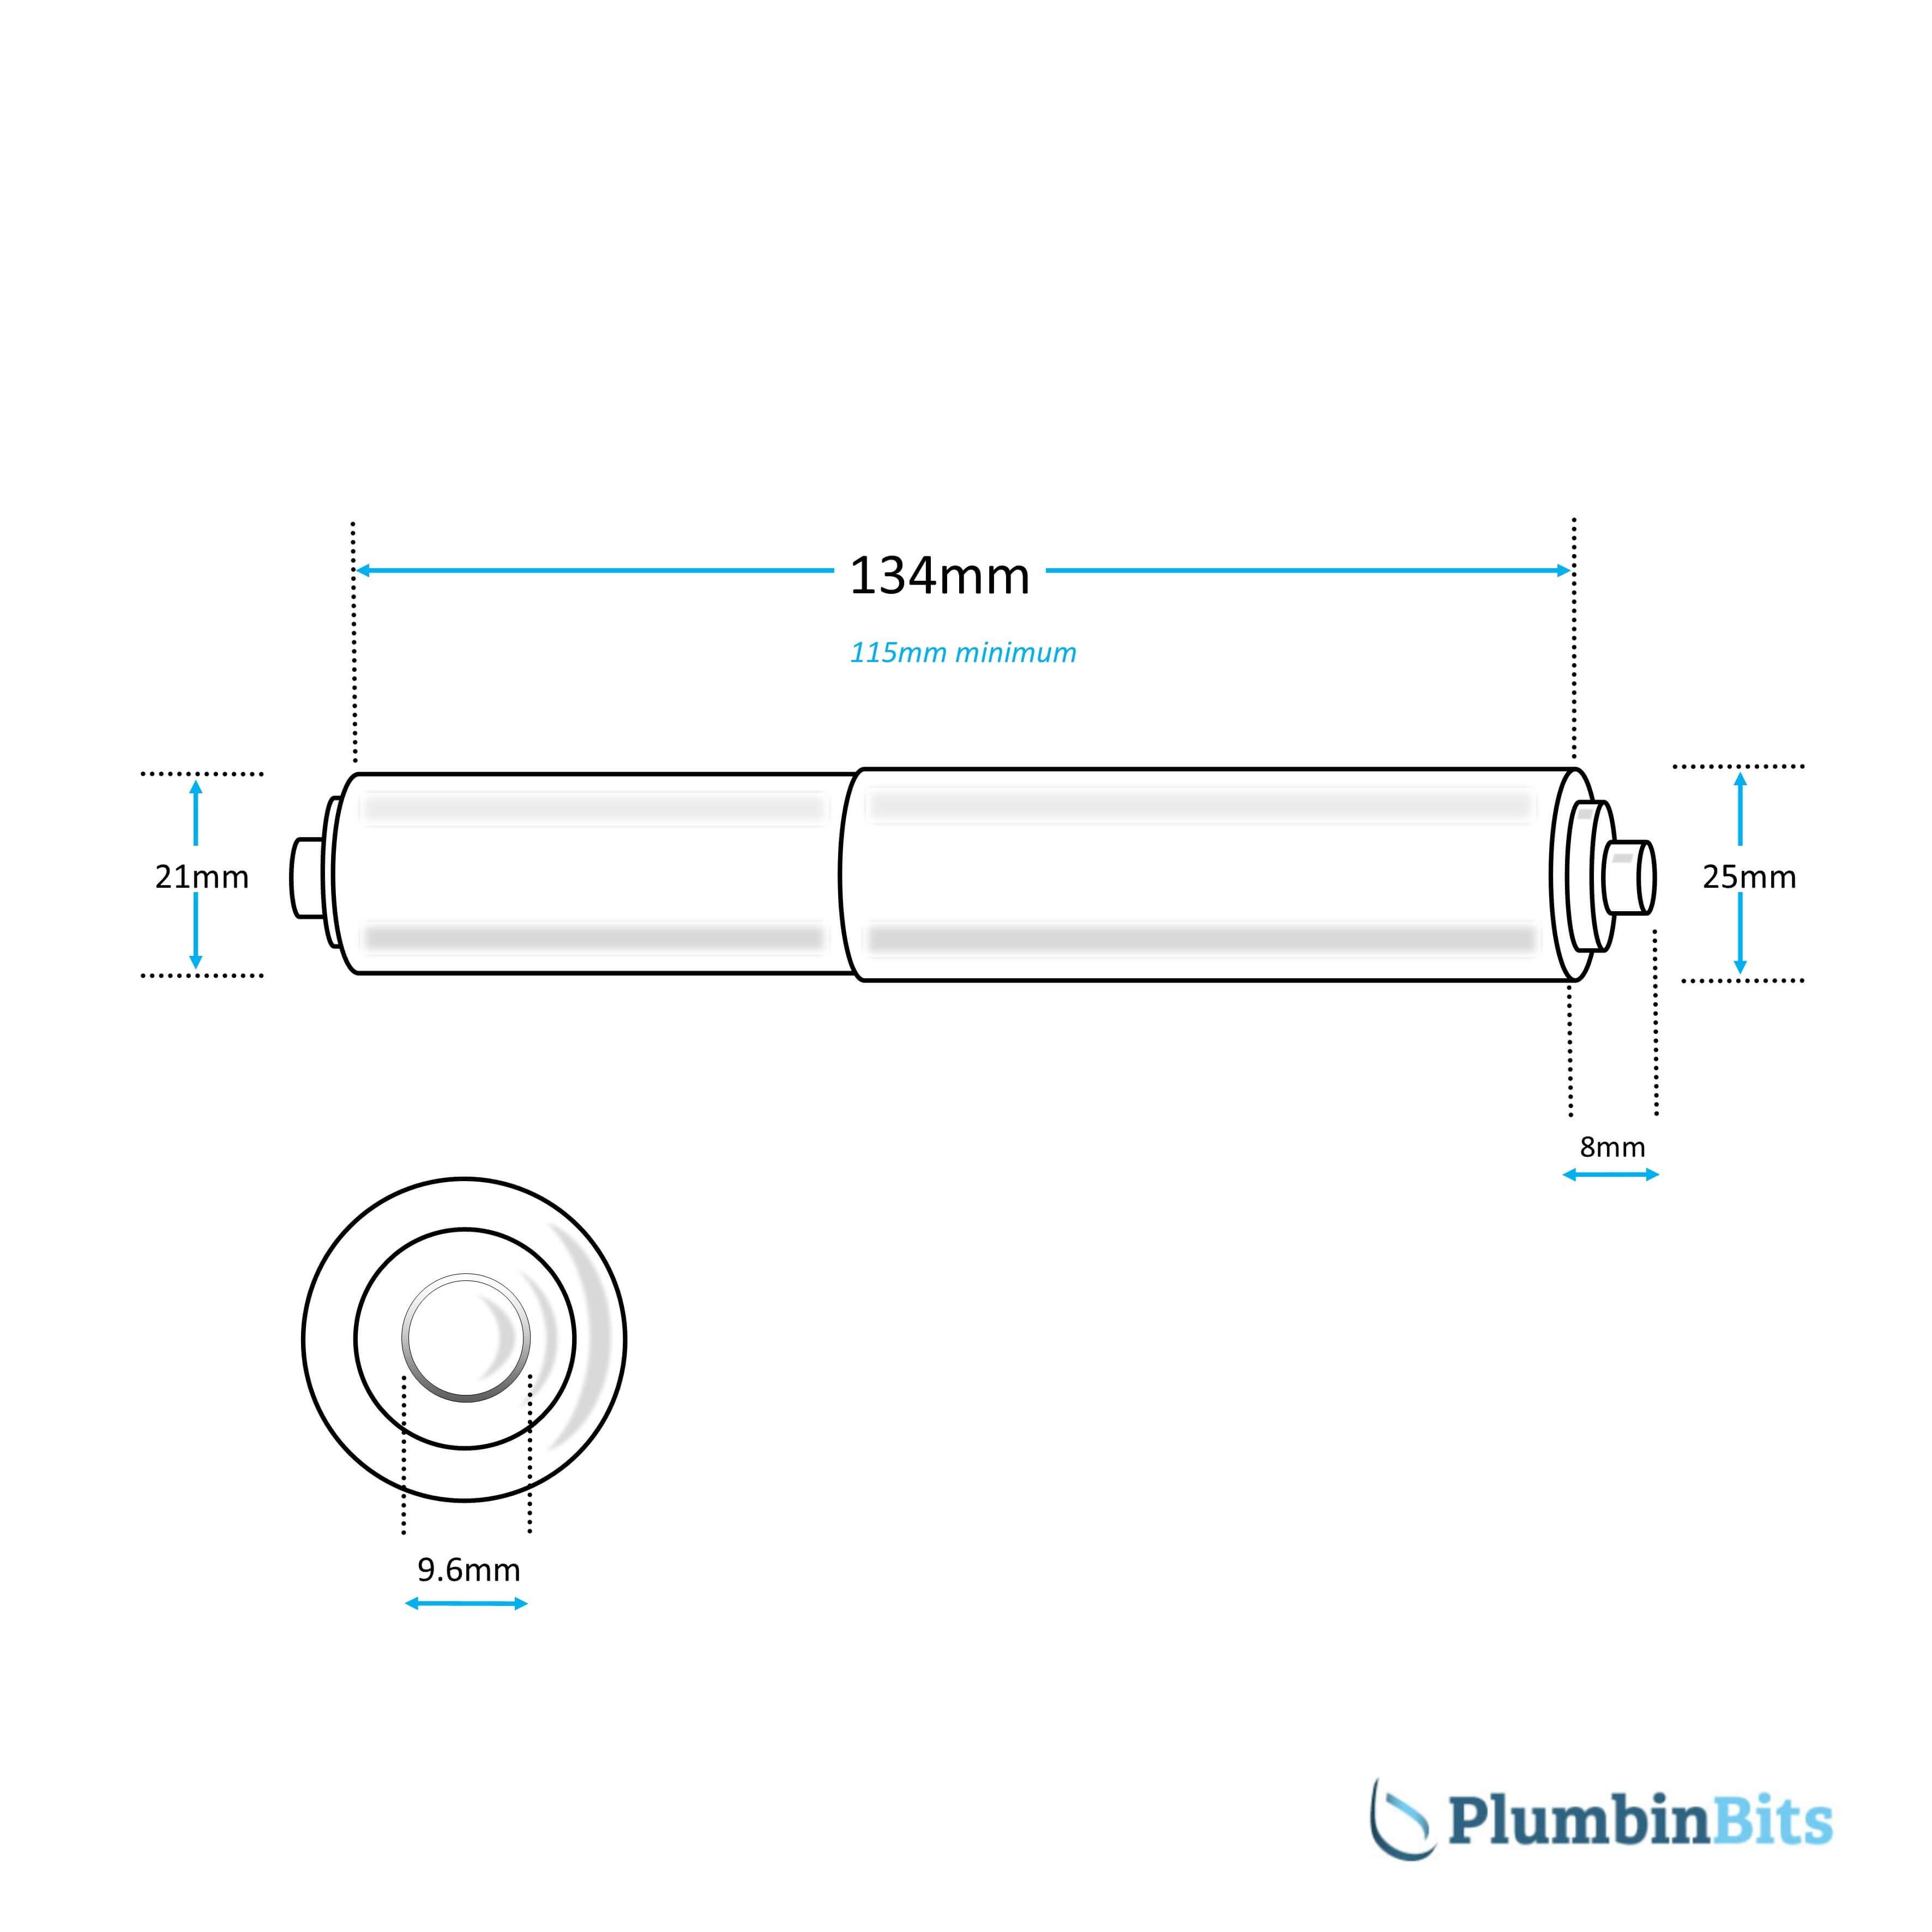 WC Roll Holder Insert Measurement